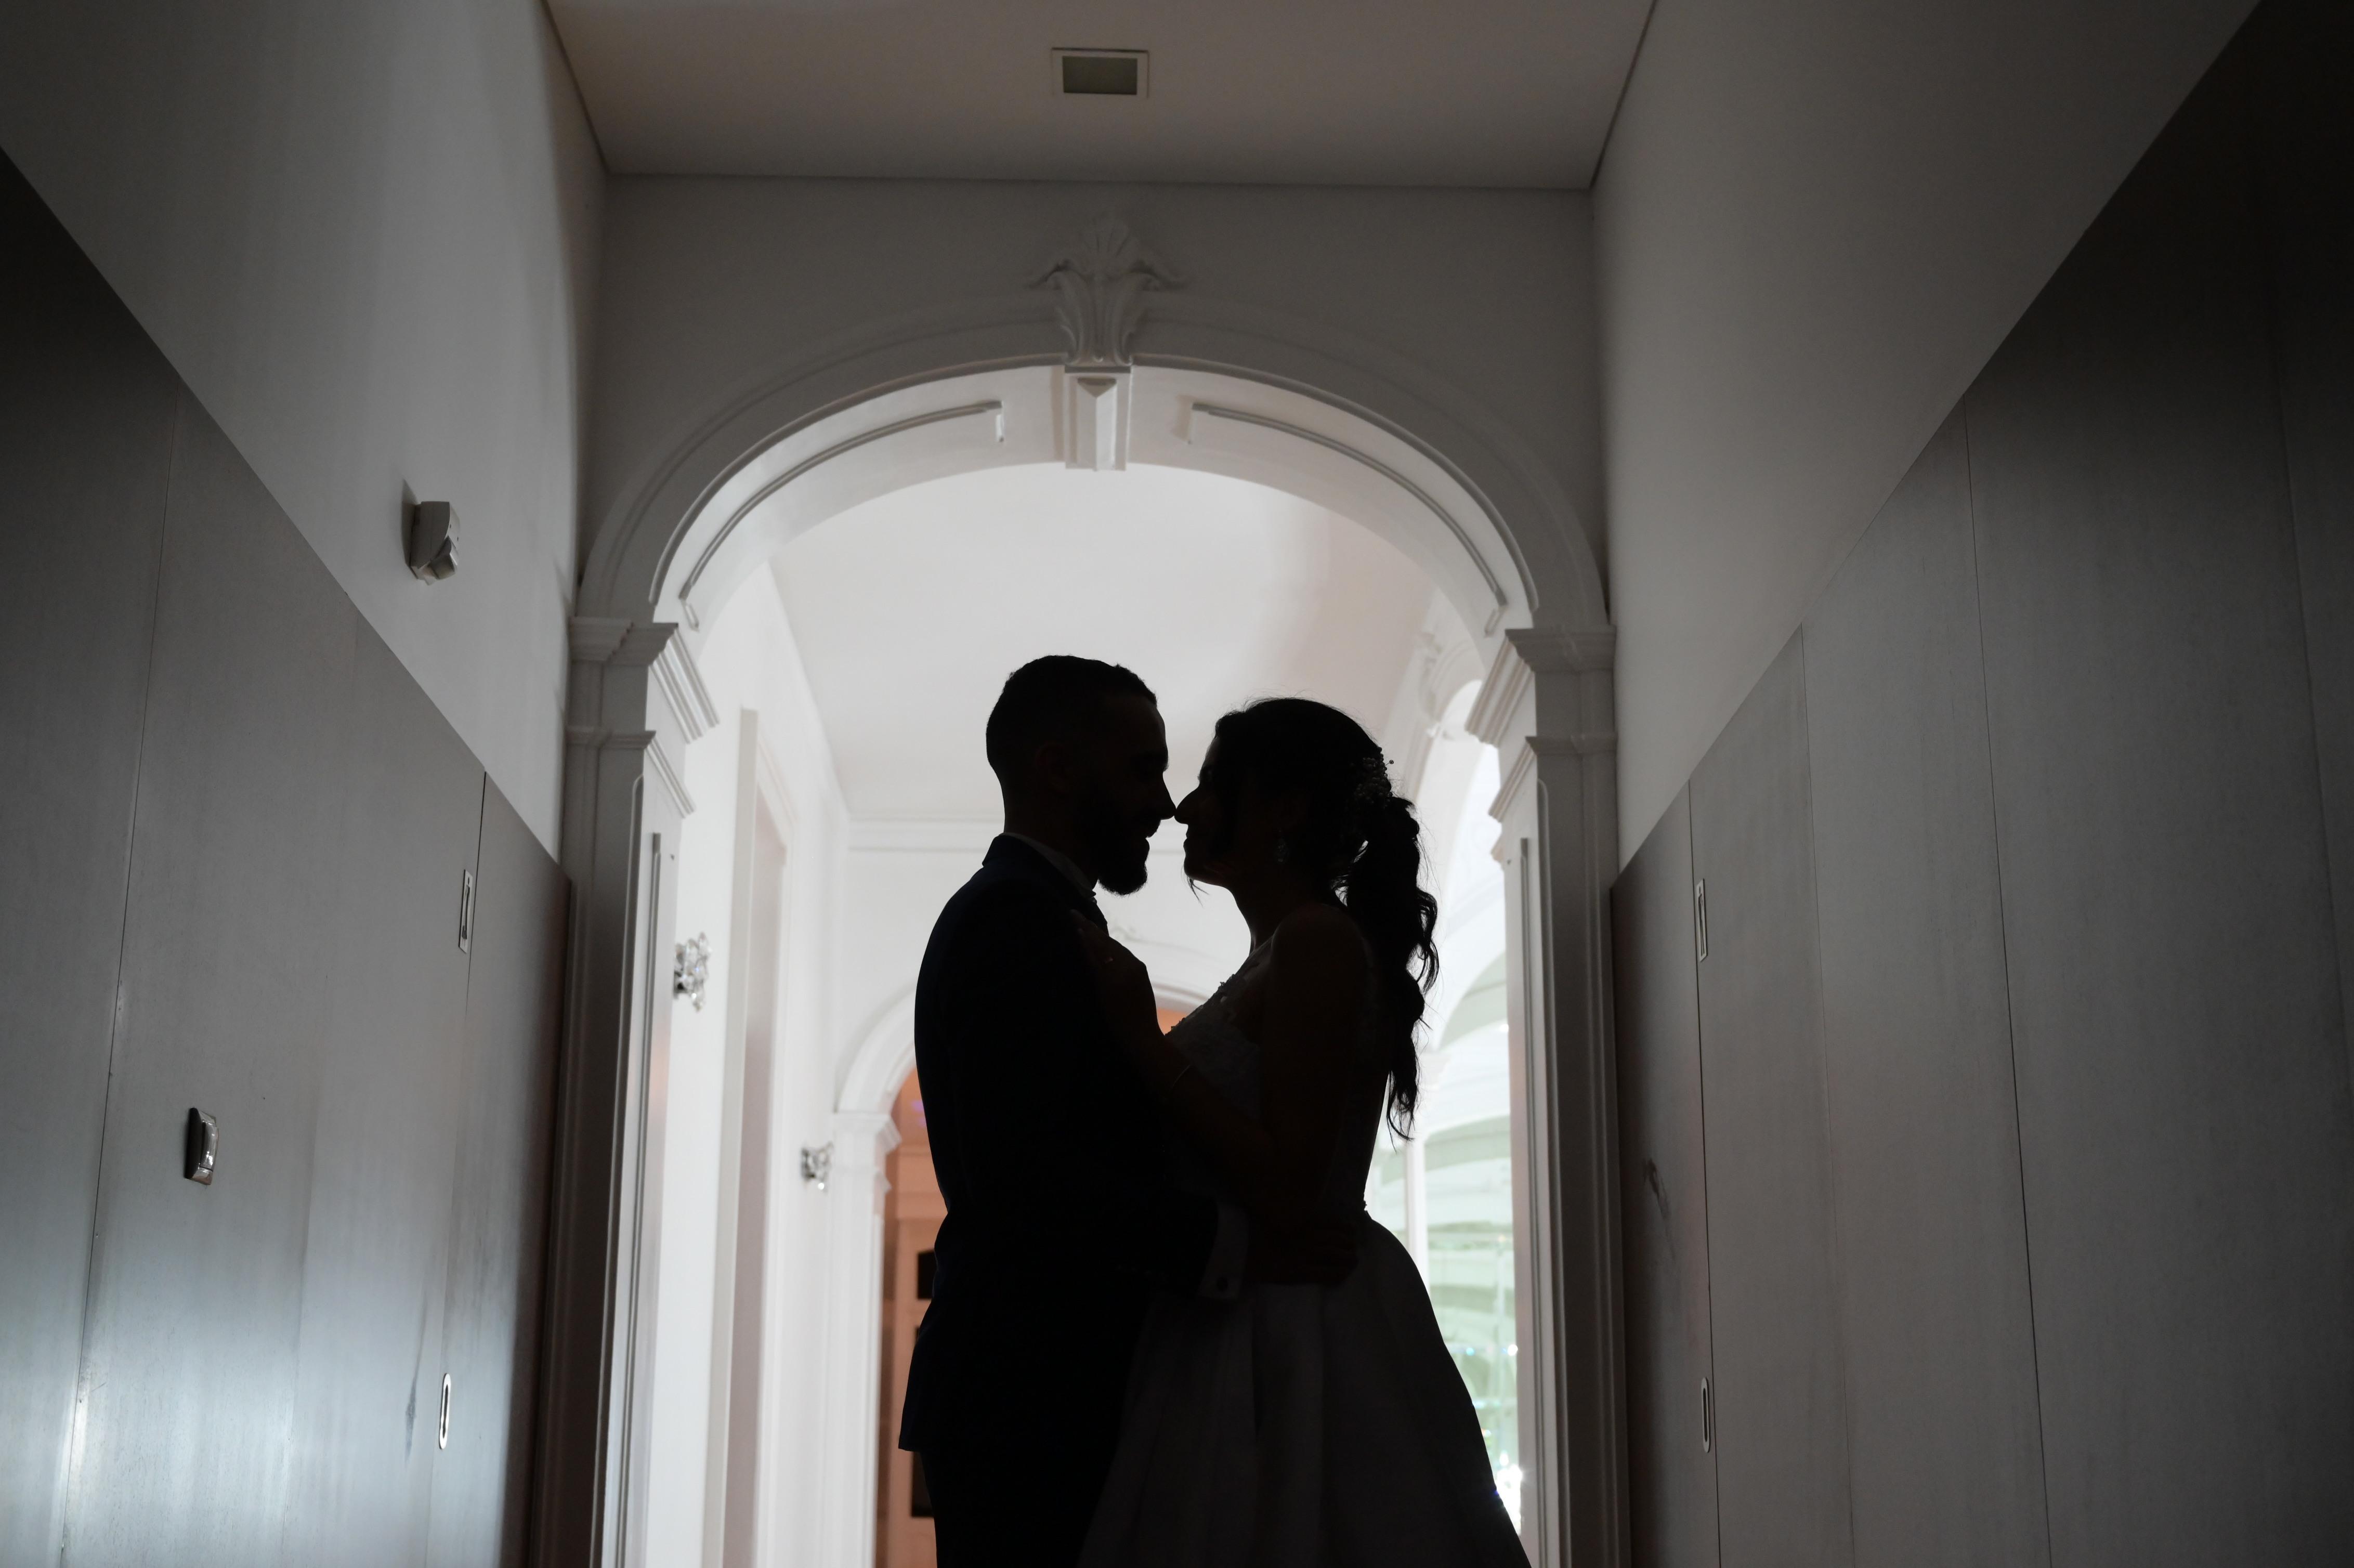 Contate humberto barbosa |  fotografia · Casamento Newborn Gravidez Publicidade Destination weddings  Santa Maria da Feira   Porto Aveiro Fotógrafo